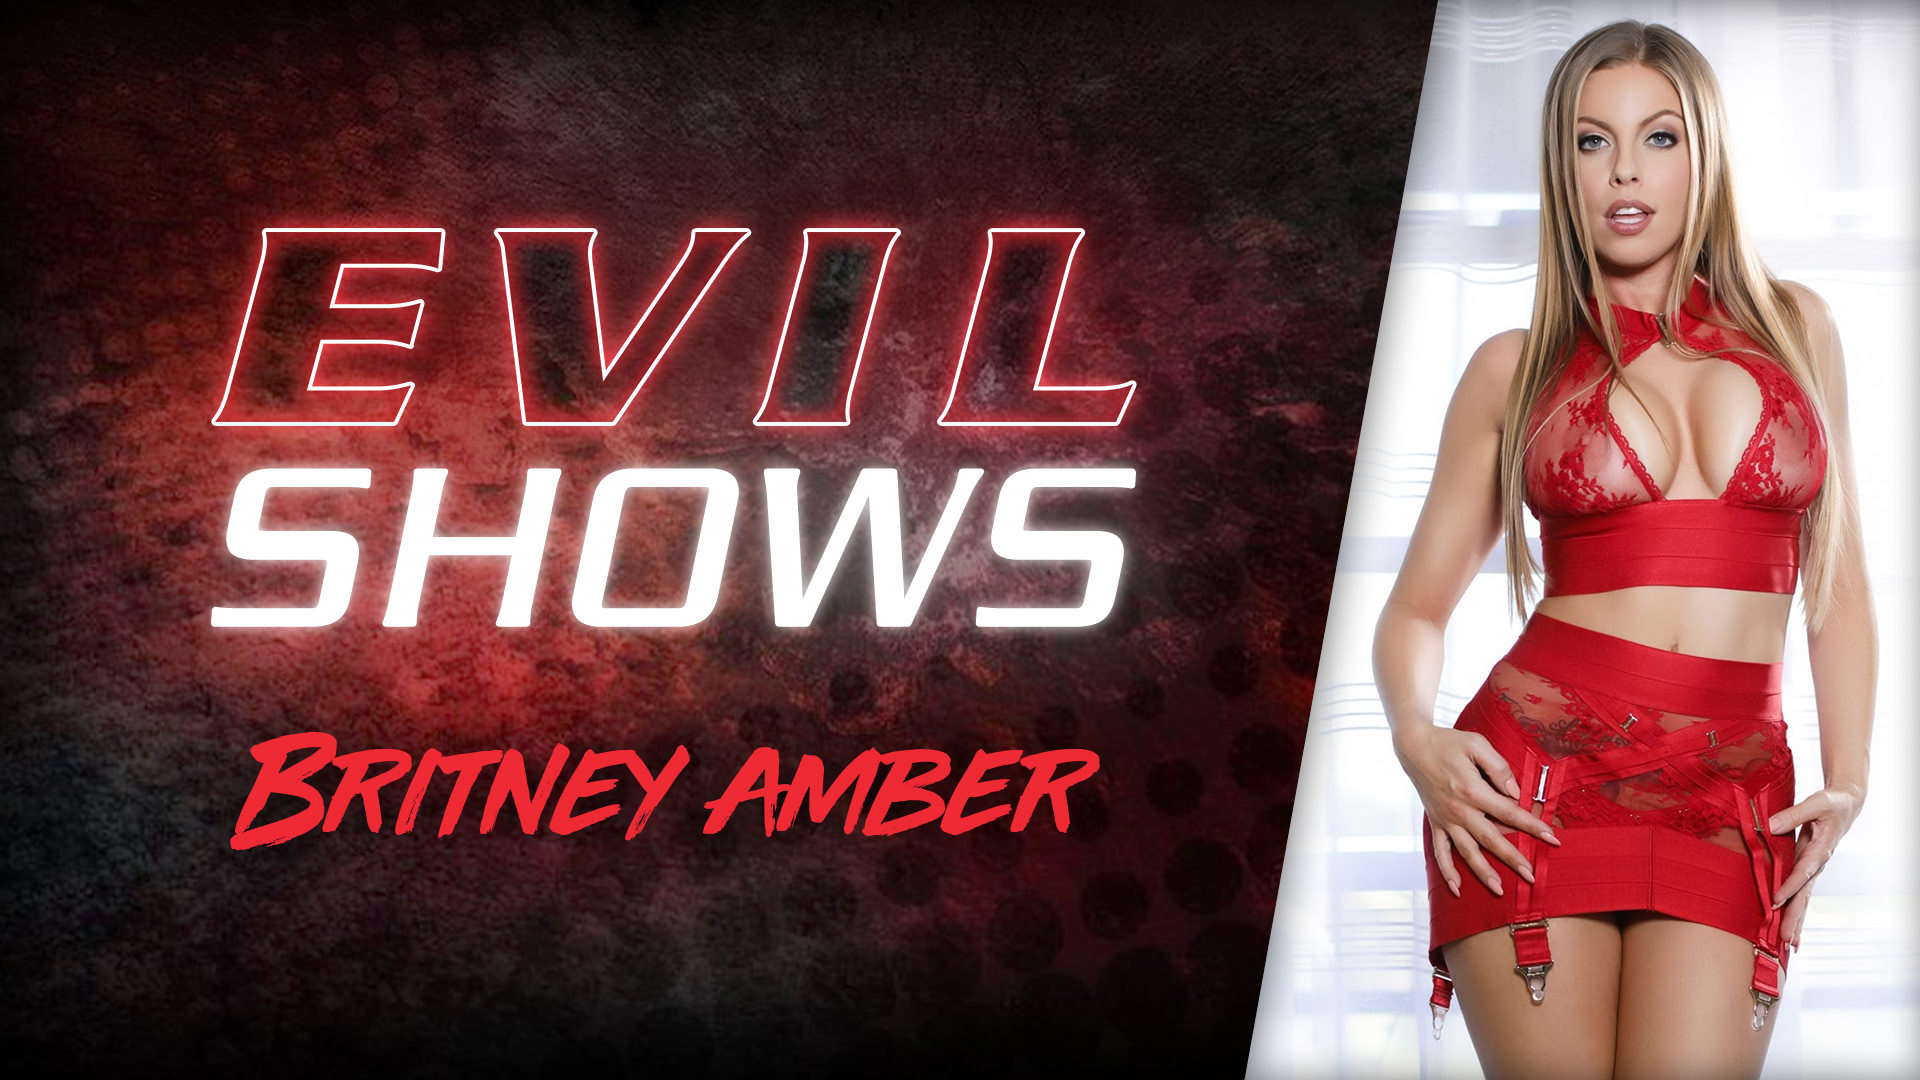 Evil Shows - Britney Amber - Britney Amber 1